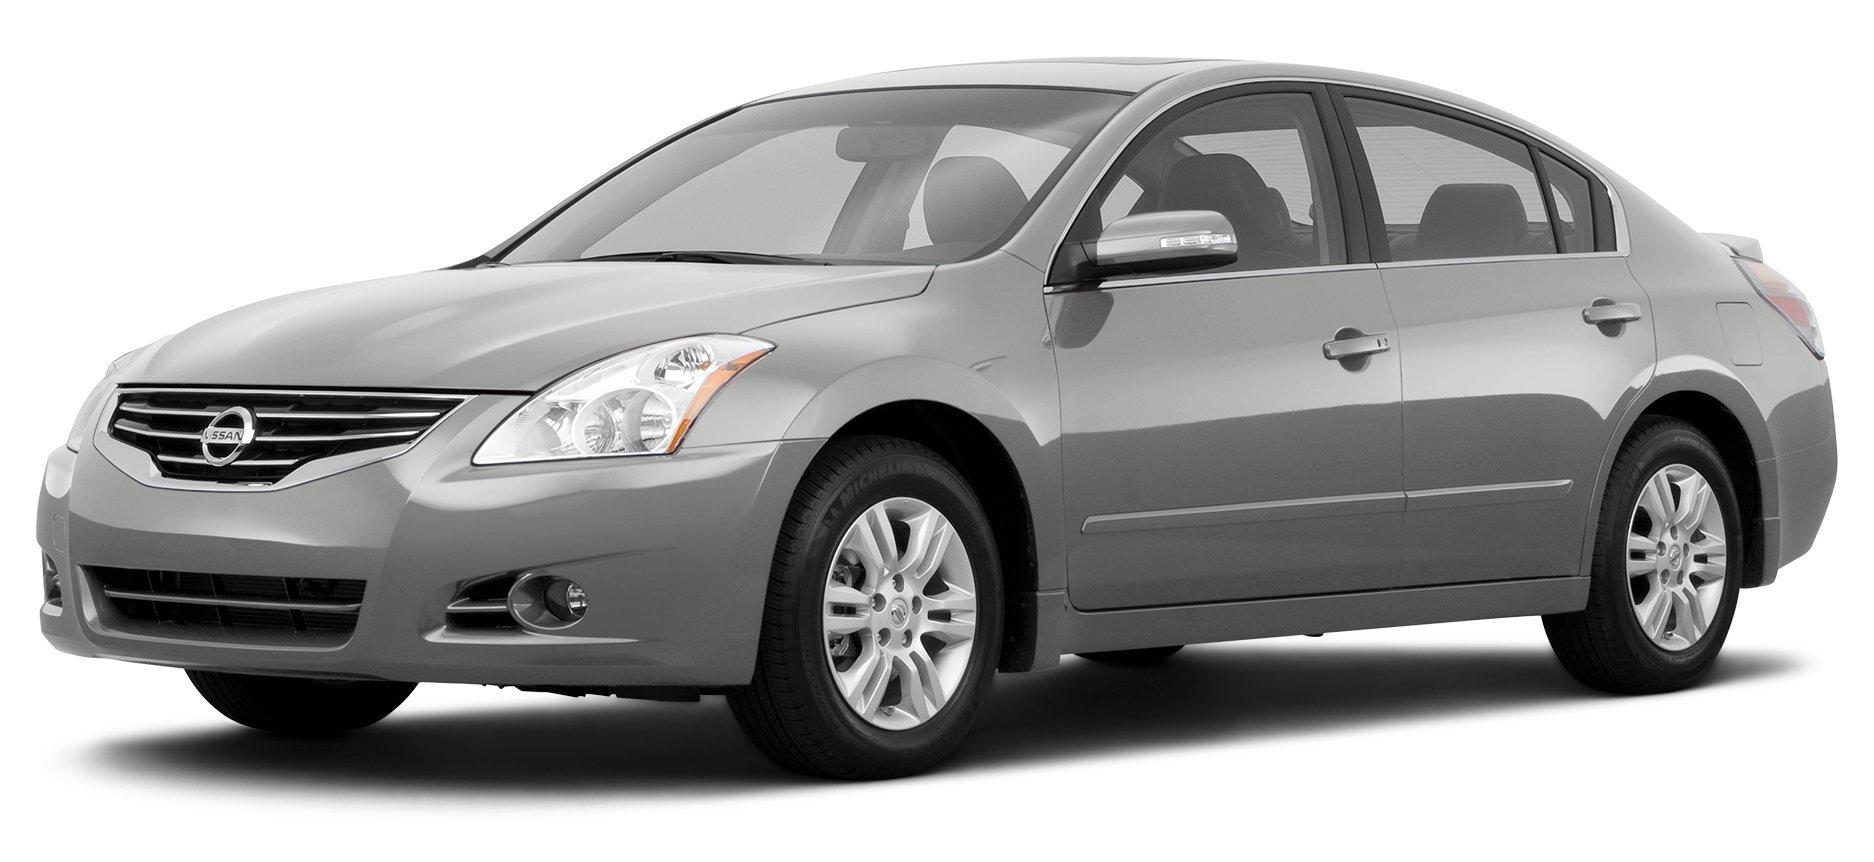 TPMS diagnostic information – Nissan Altima 2007-2019 - ATEQ